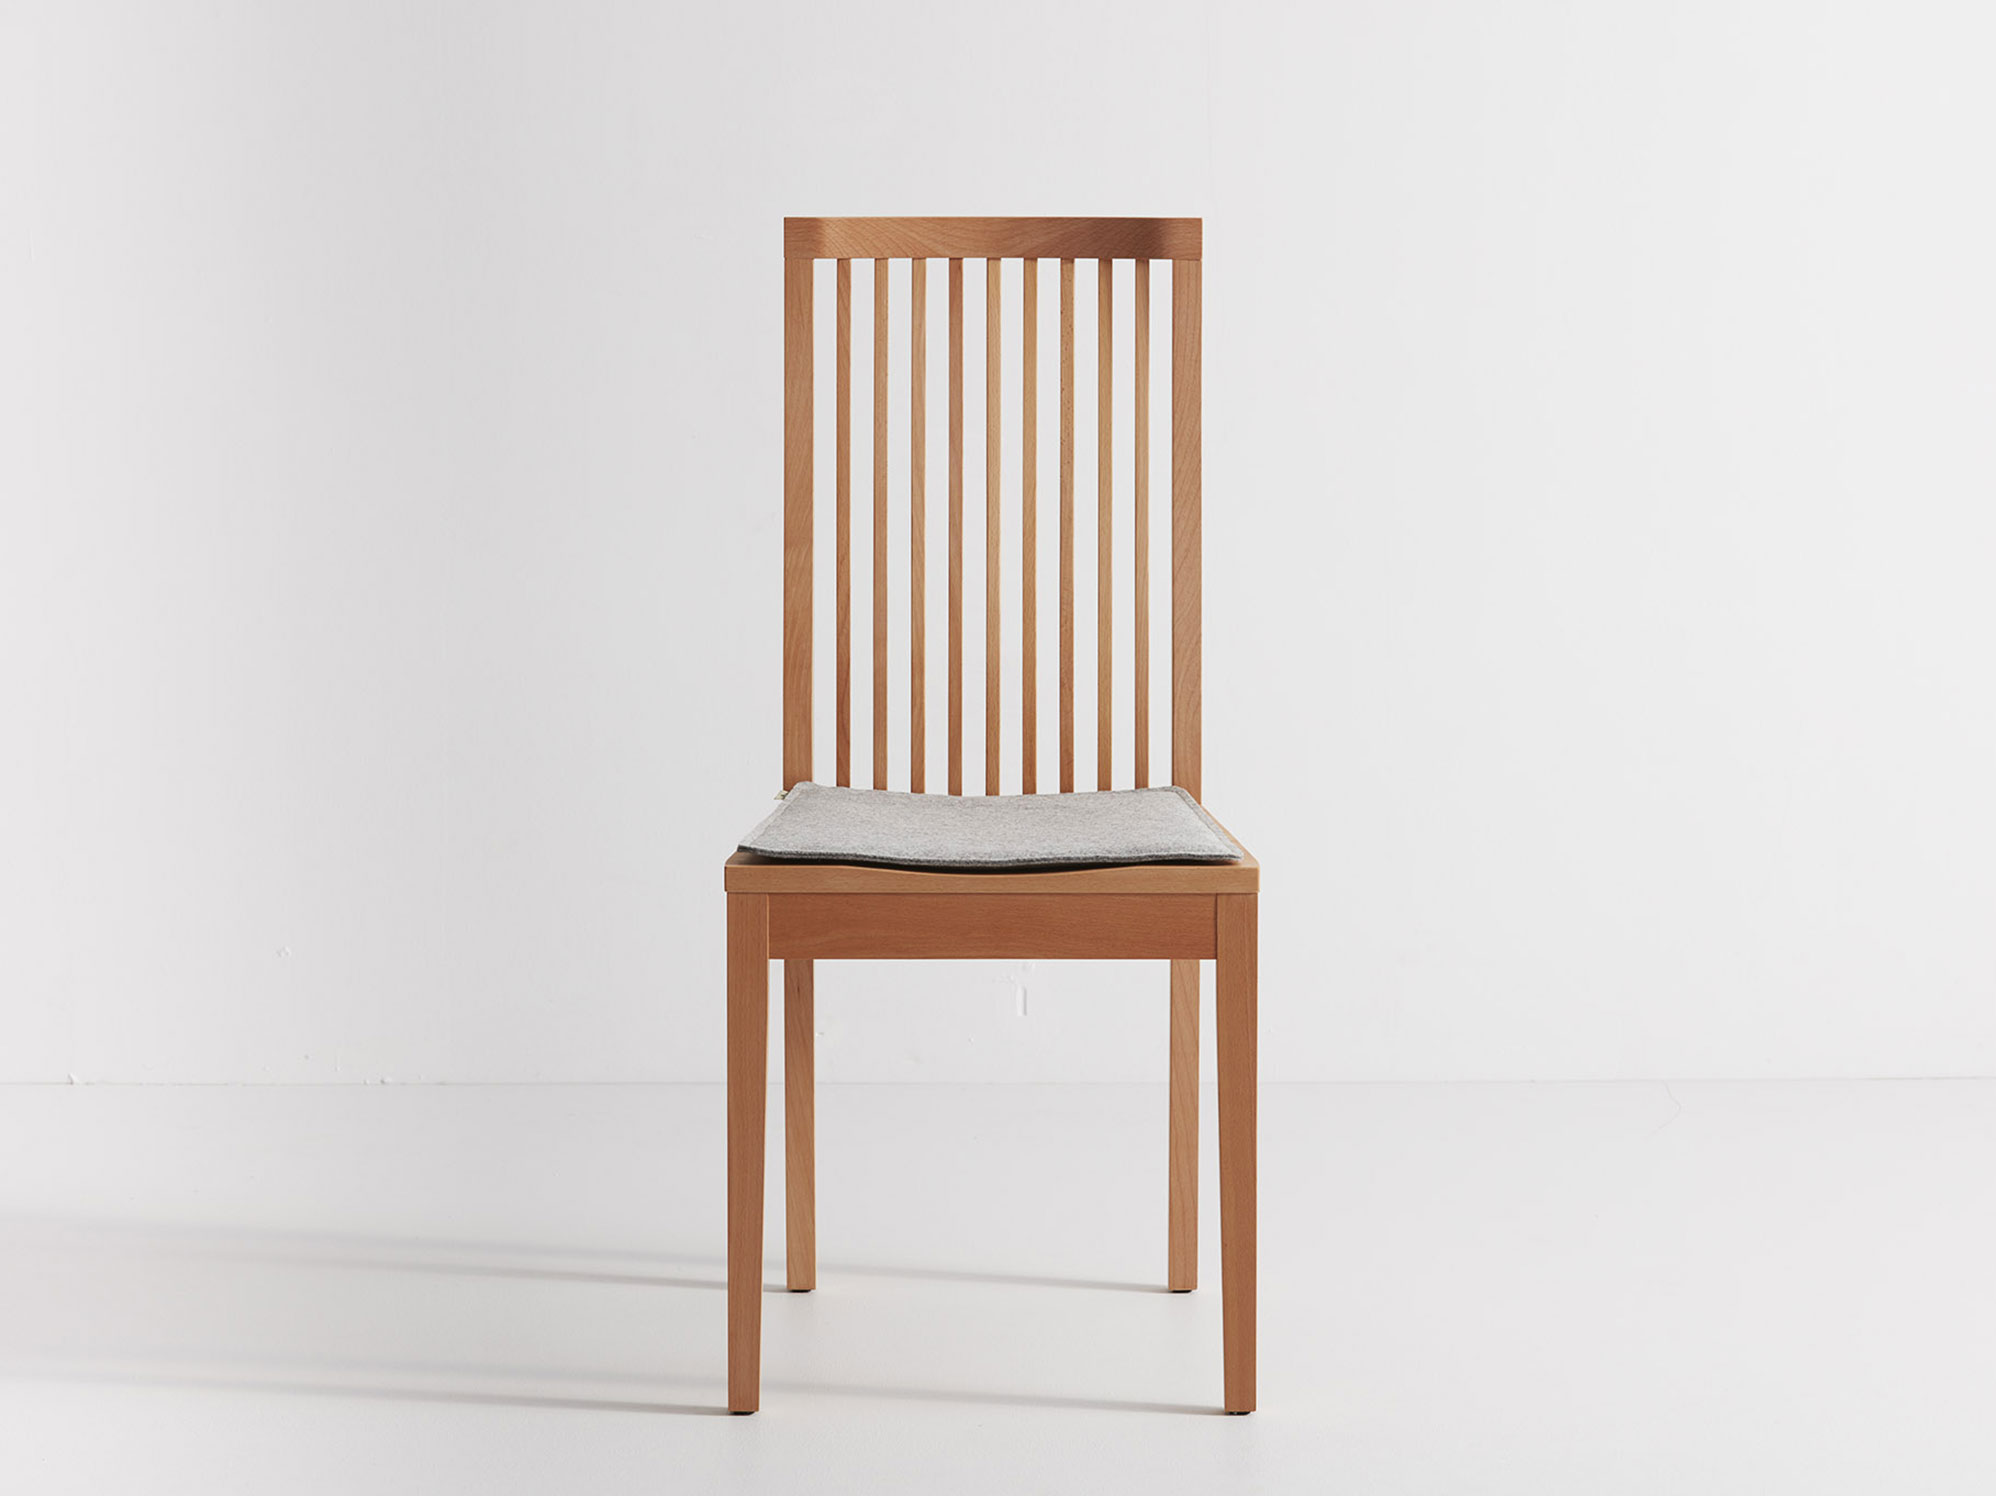 stuhlauflage f r stuhl achill 100 schafschurwoll filz gr ne erde. Black Bedroom Furniture Sets. Home Design Ideas